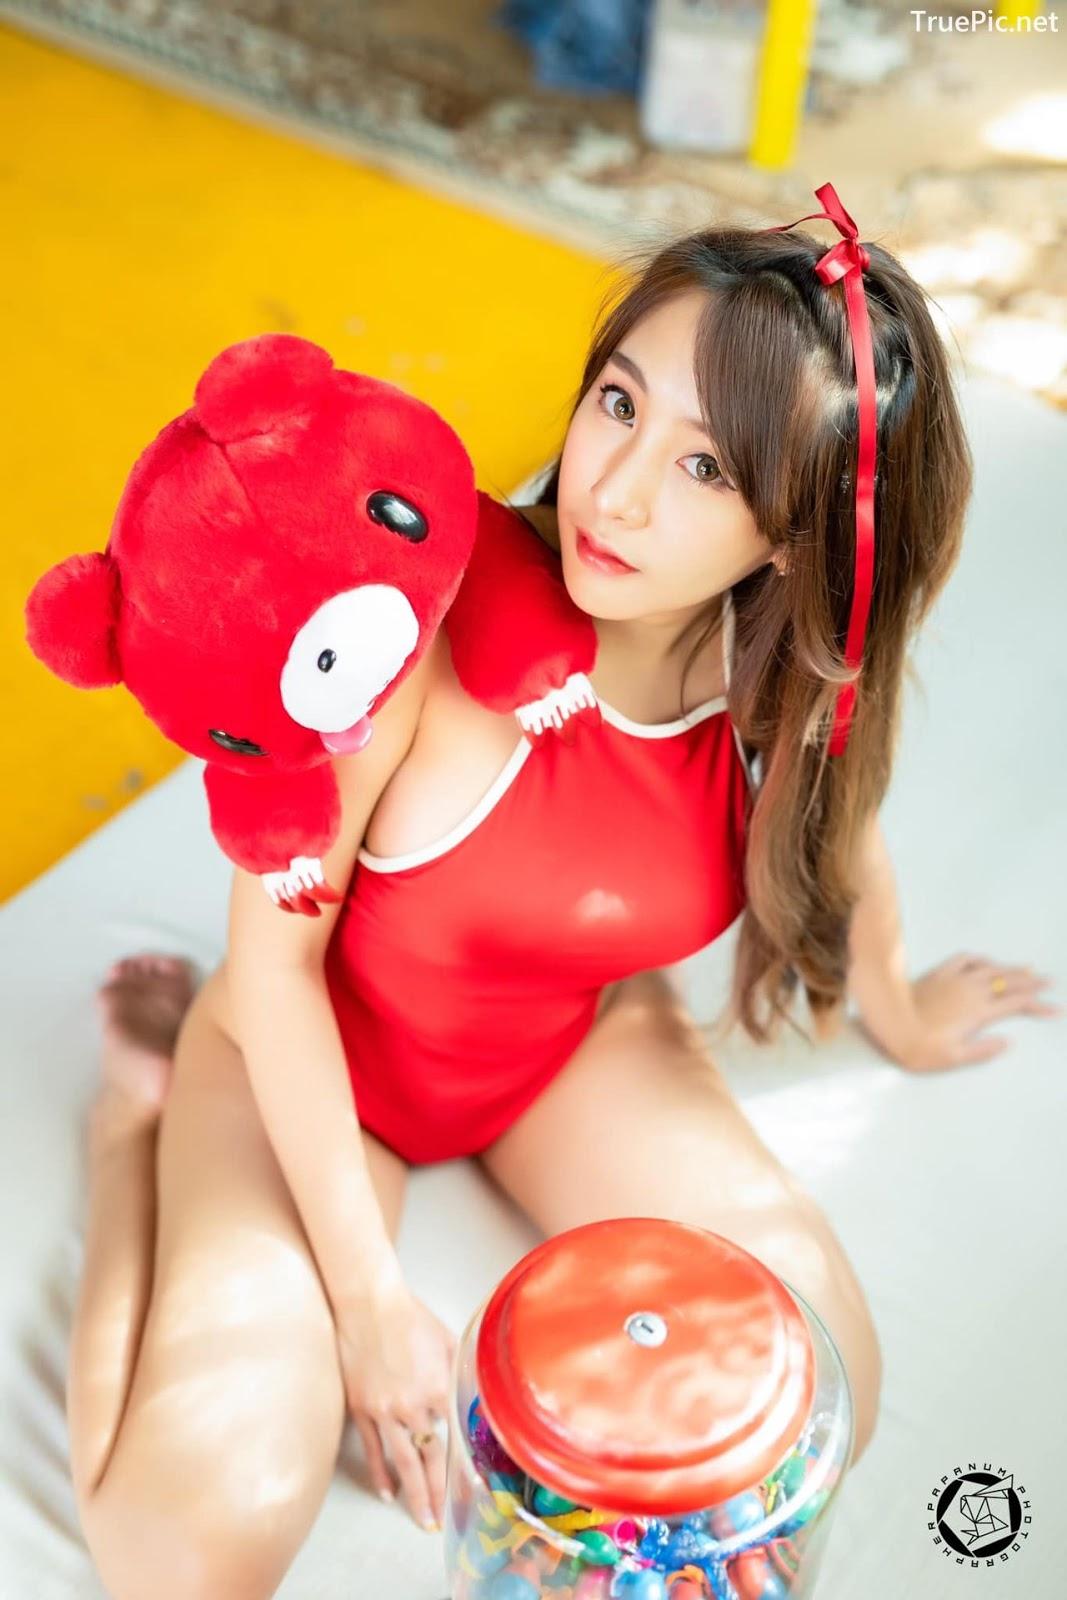 Image-Thailand-Sexy-Model-Suneta-Ngachalvy-Concept-Gloomy-Bear-TruePic.net- Picture-4